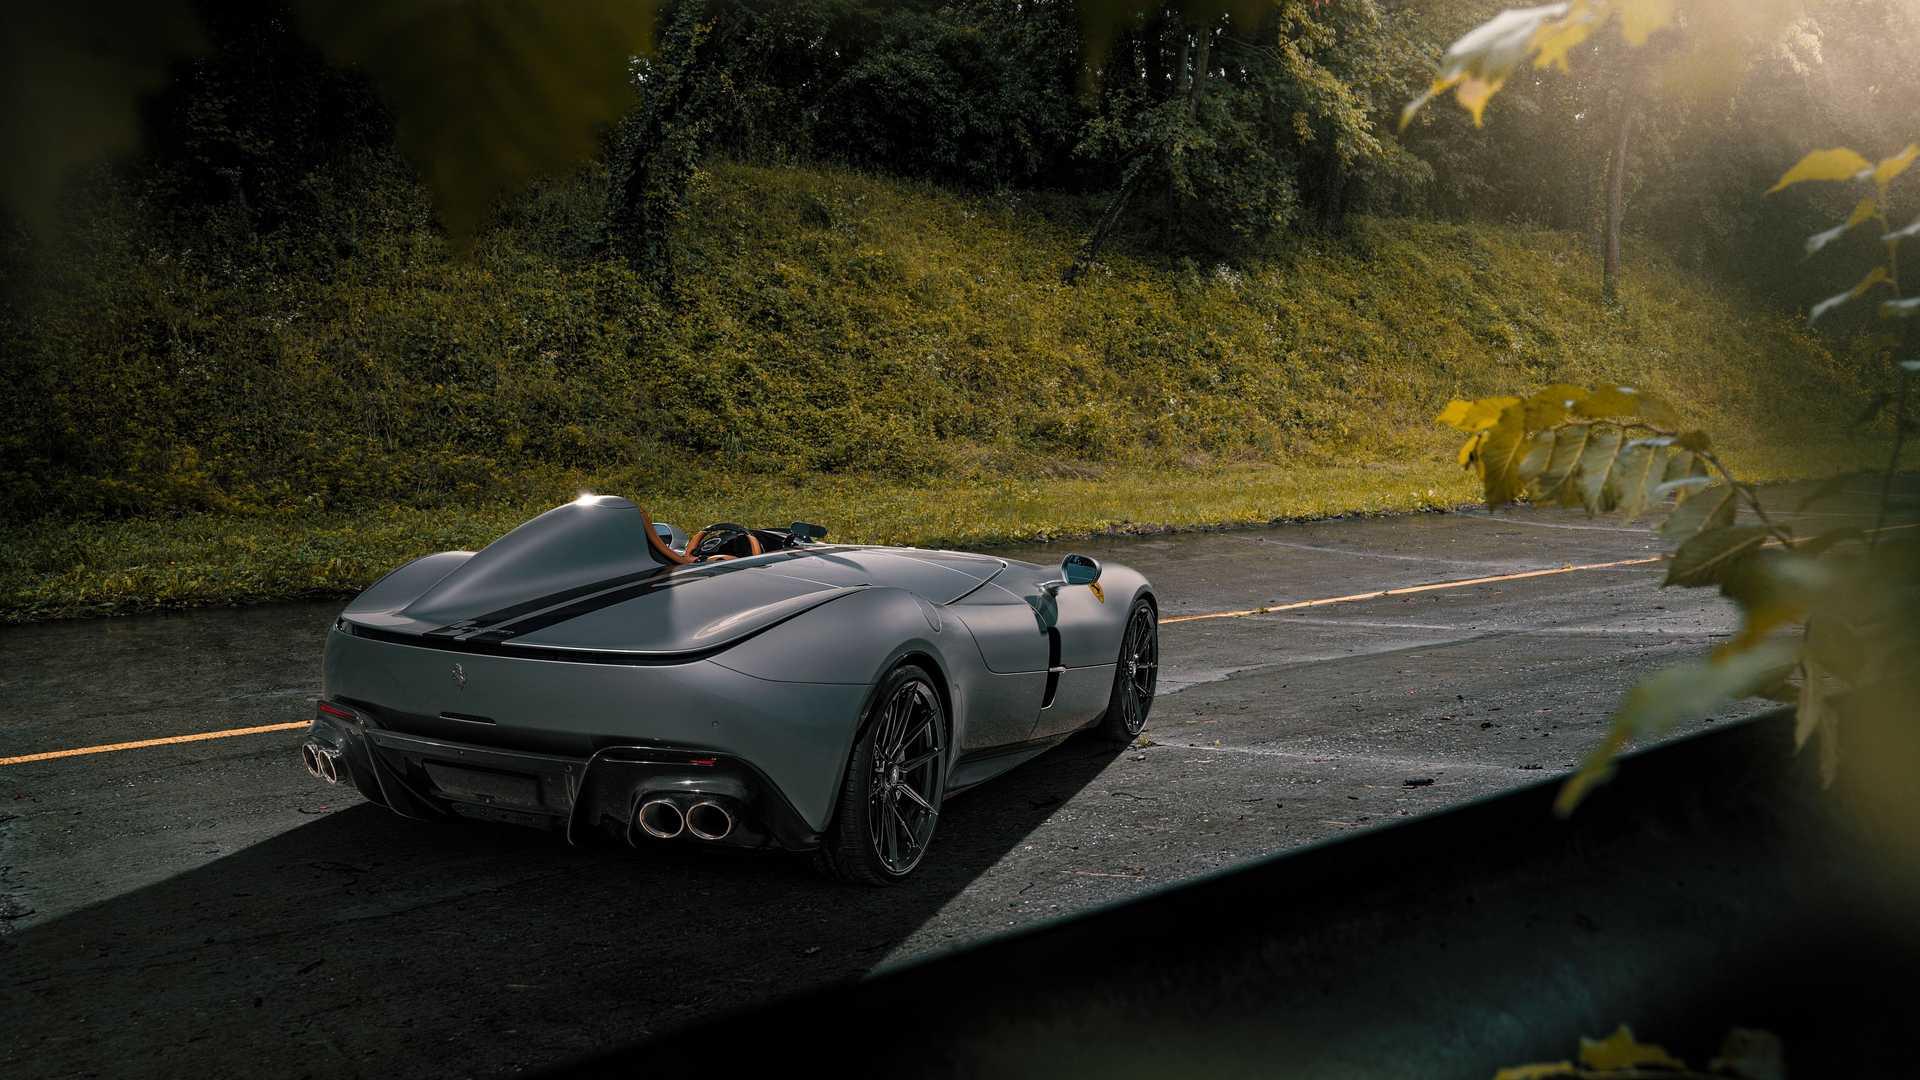 Ferrari_Monza_SP1_tuning_by_Novitec_0003